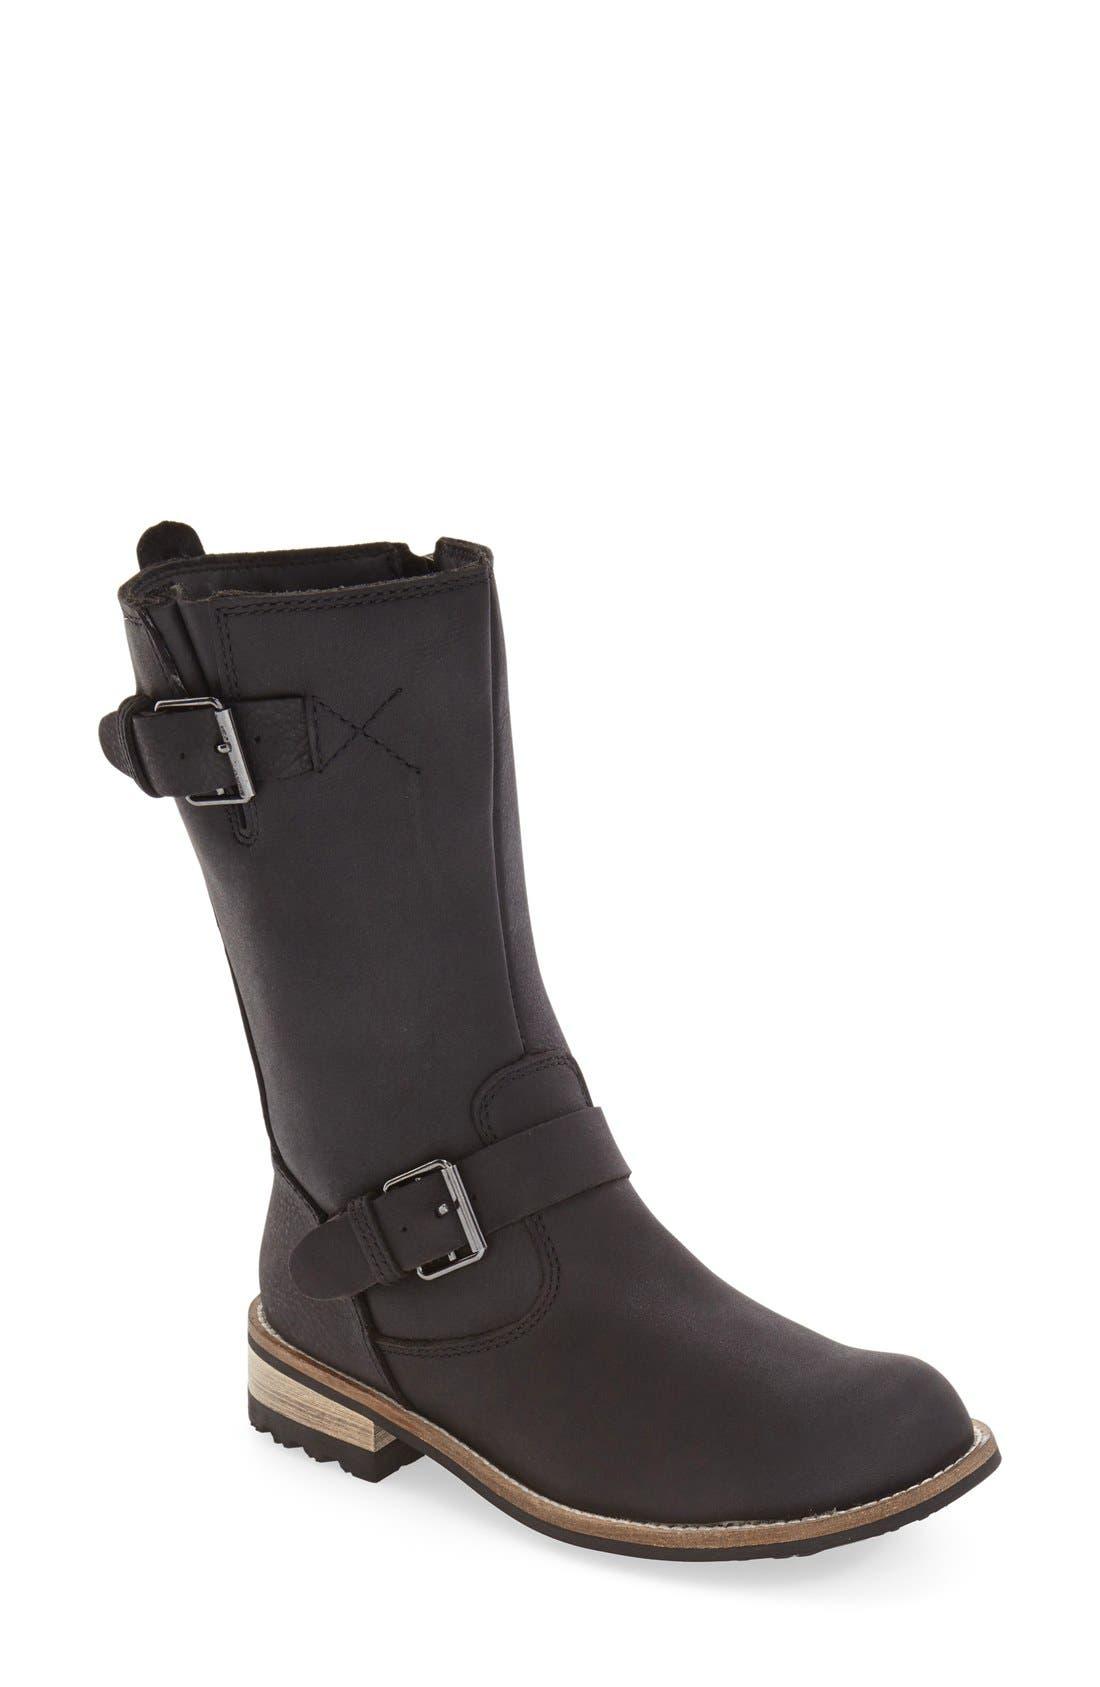 'Alcona' Waterproof Boot, Main, color, 001